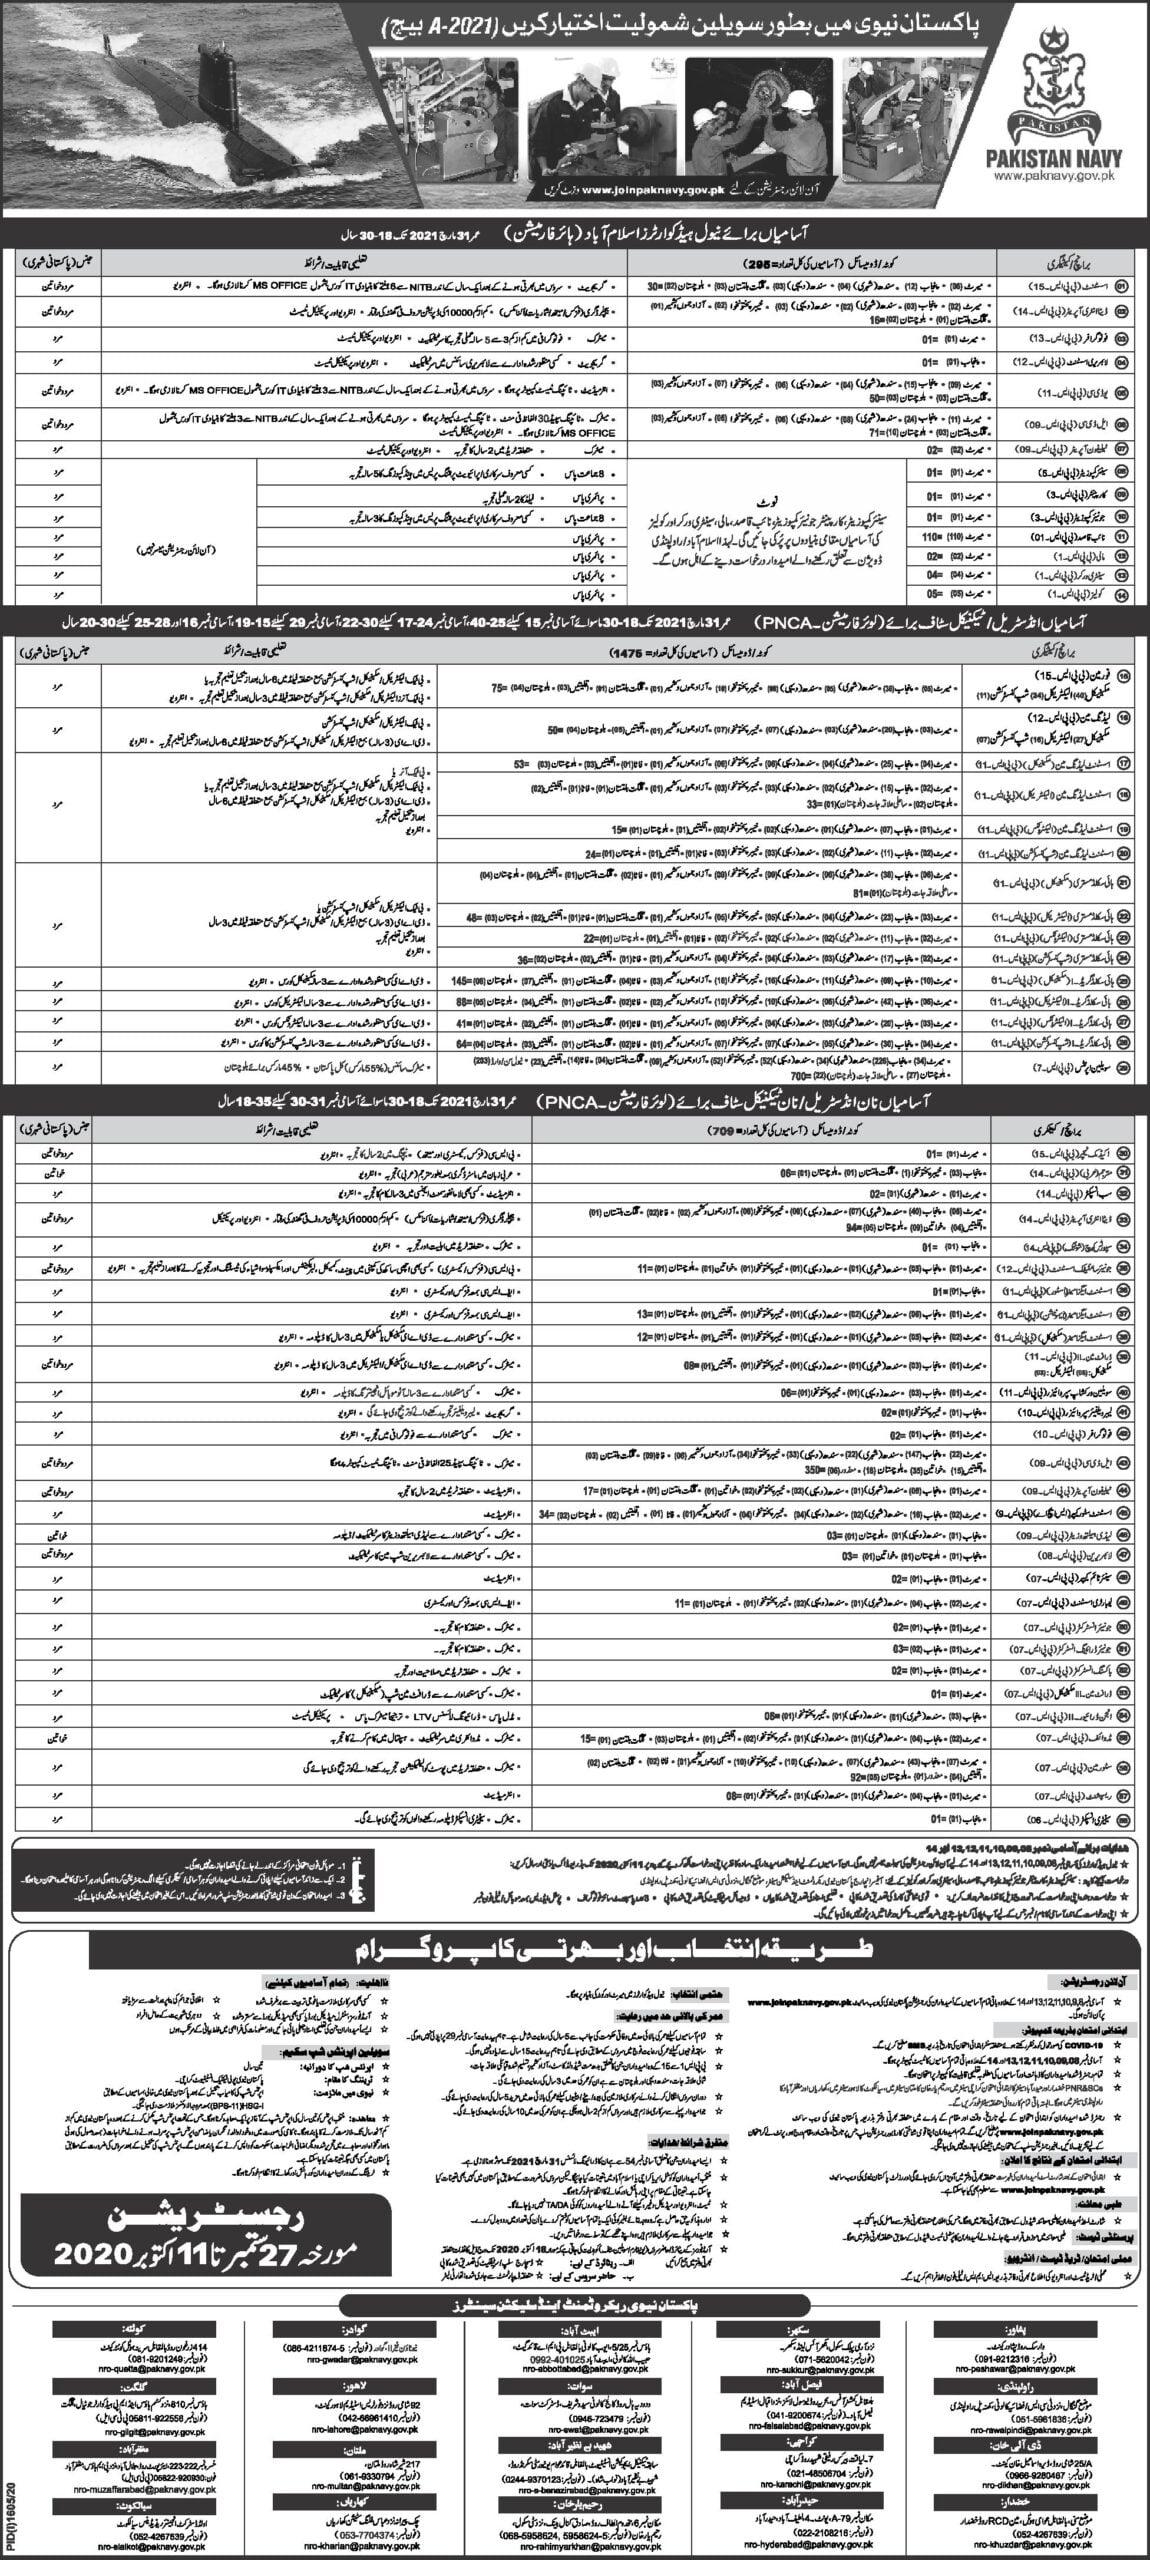 Join Pak Navy Jobs 2020 as Civilian Online Registration Oct 2020